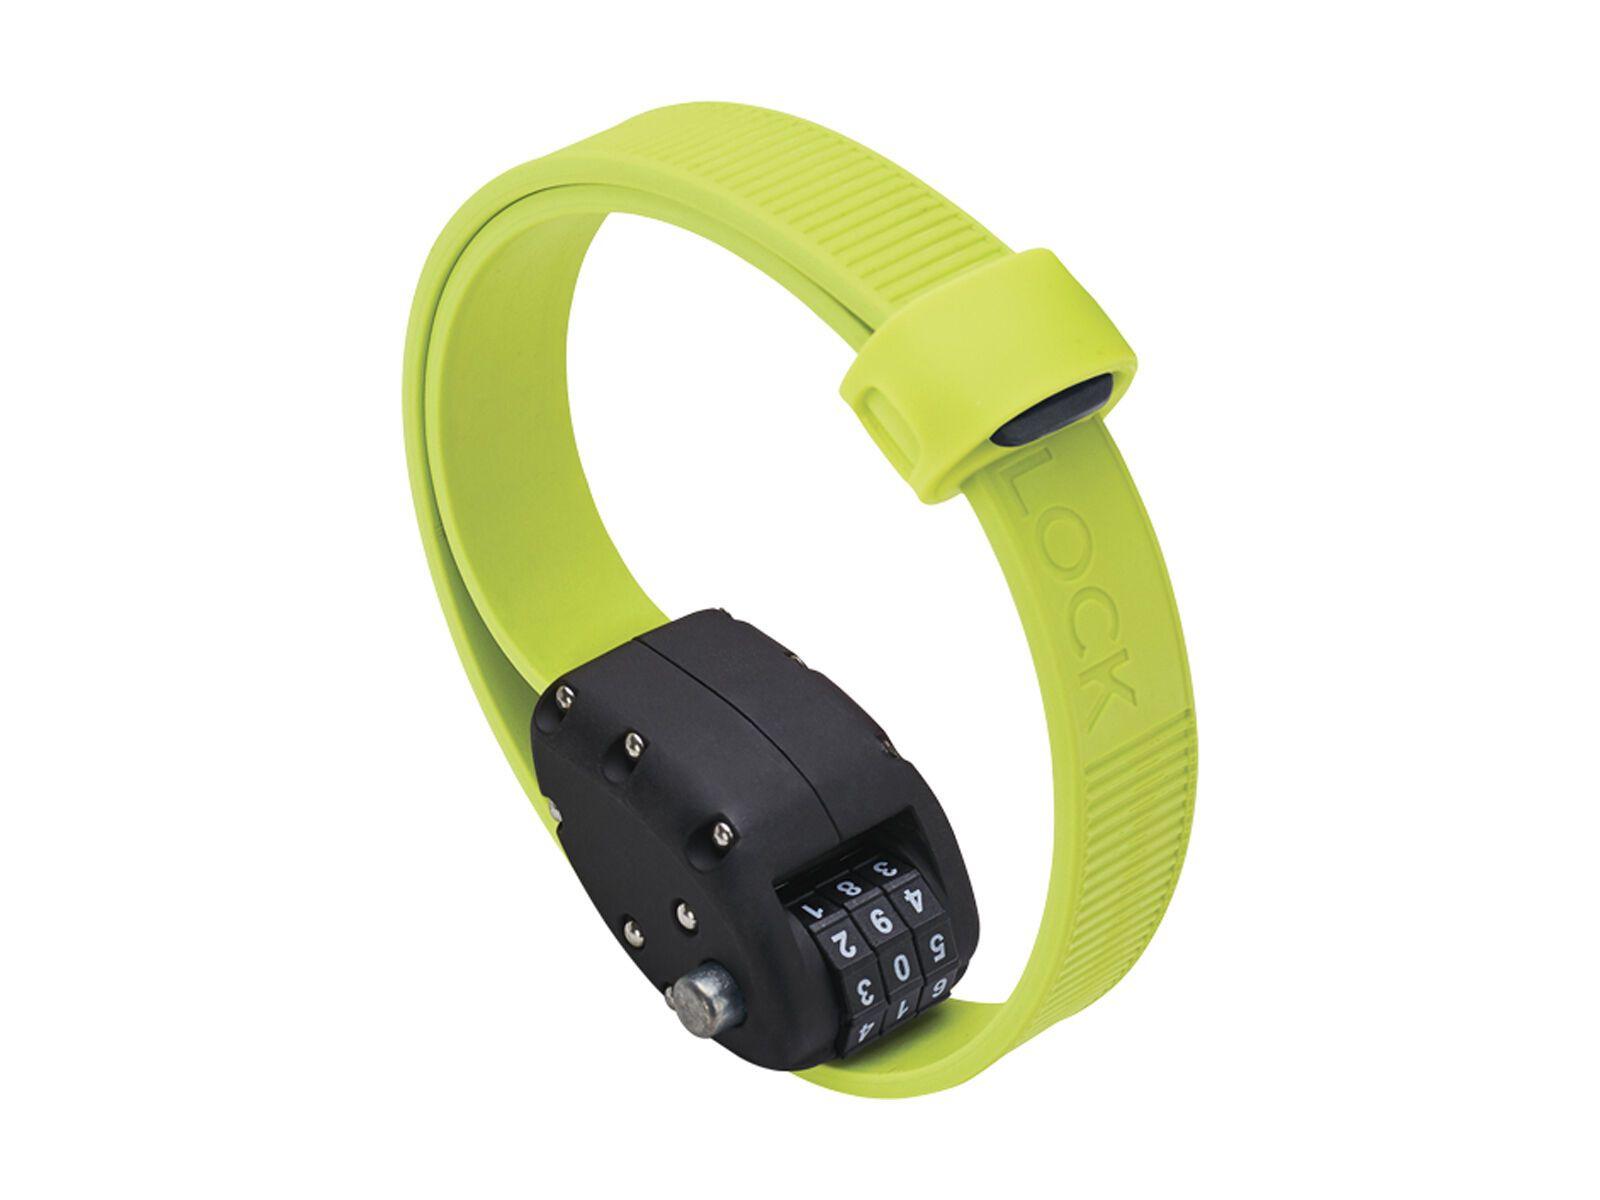 Otto DesignWorks Ottolock Cinch Lock - 46 cm, flash green - Fahrradschloss 202045